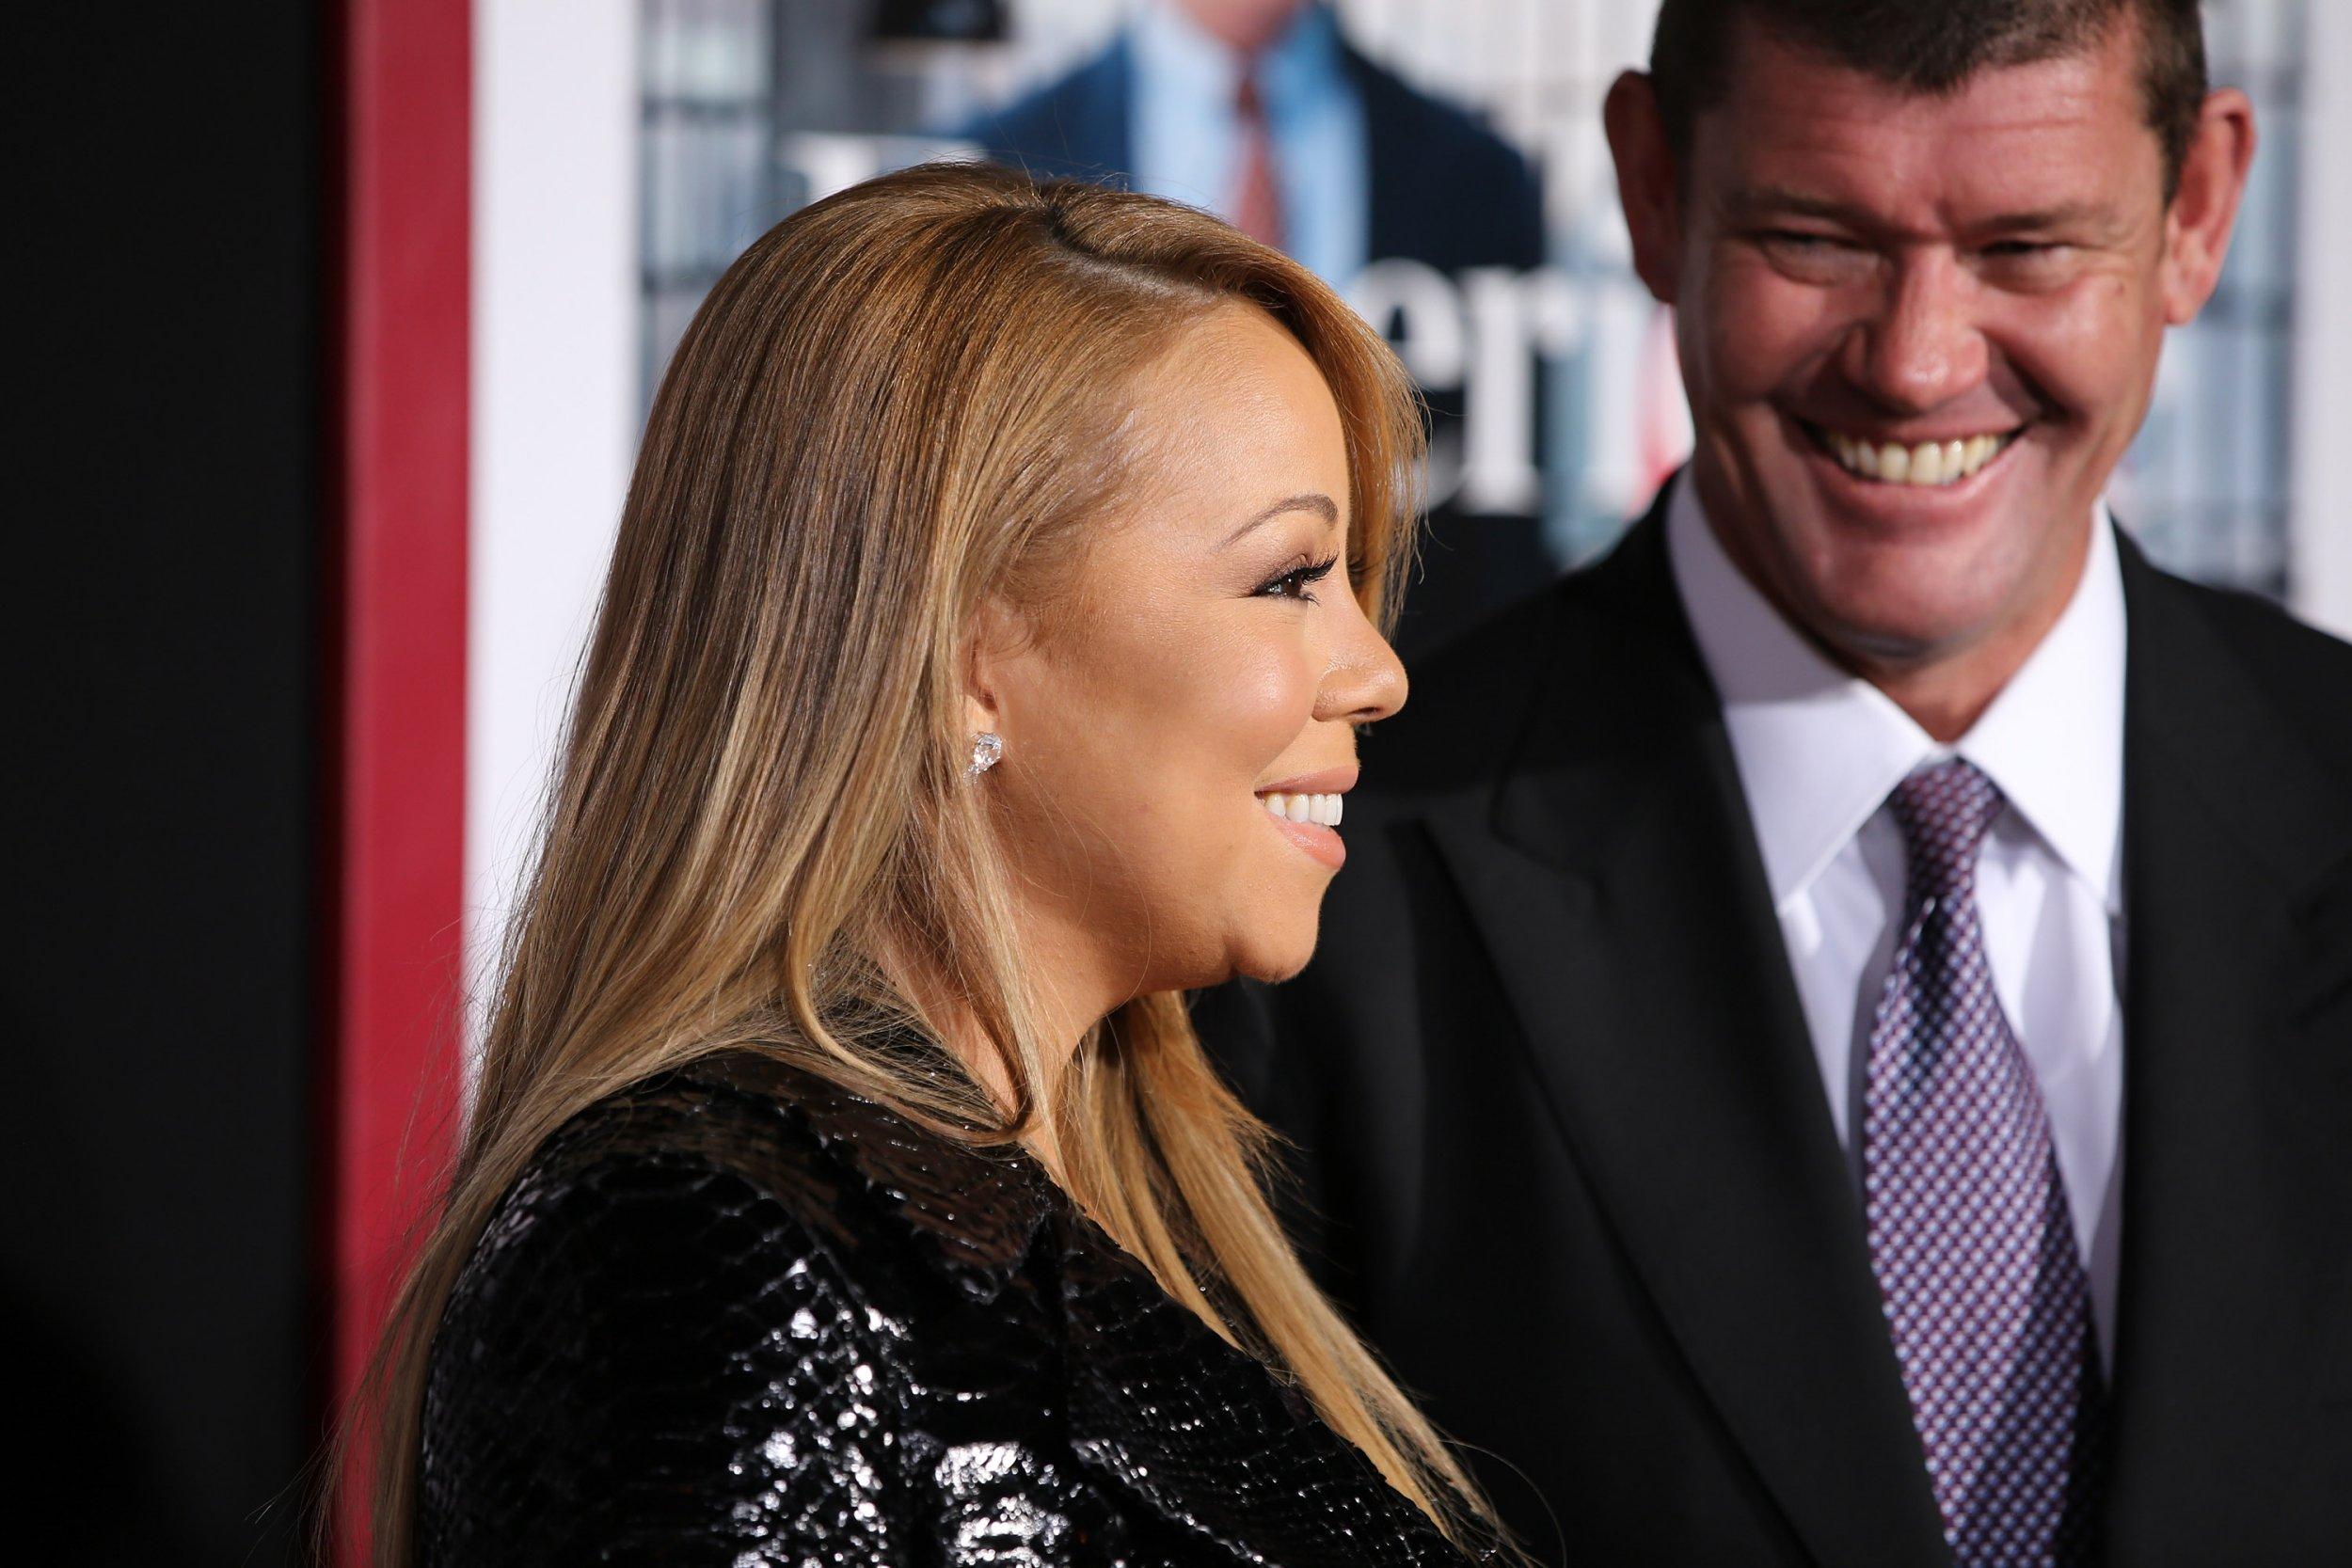 Mariah Carey engaged to Australia's fourth richest man James Packer